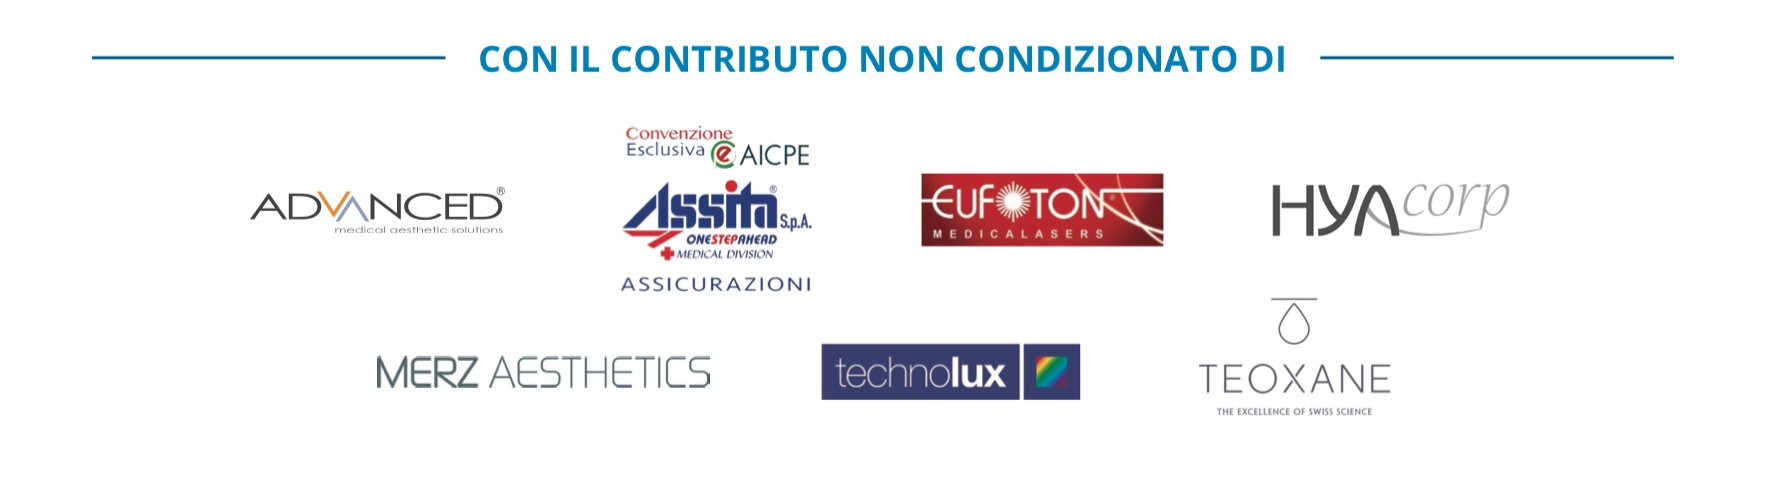 2° CORSO AICPE 2018 Bologna | 14.04.18 | 2